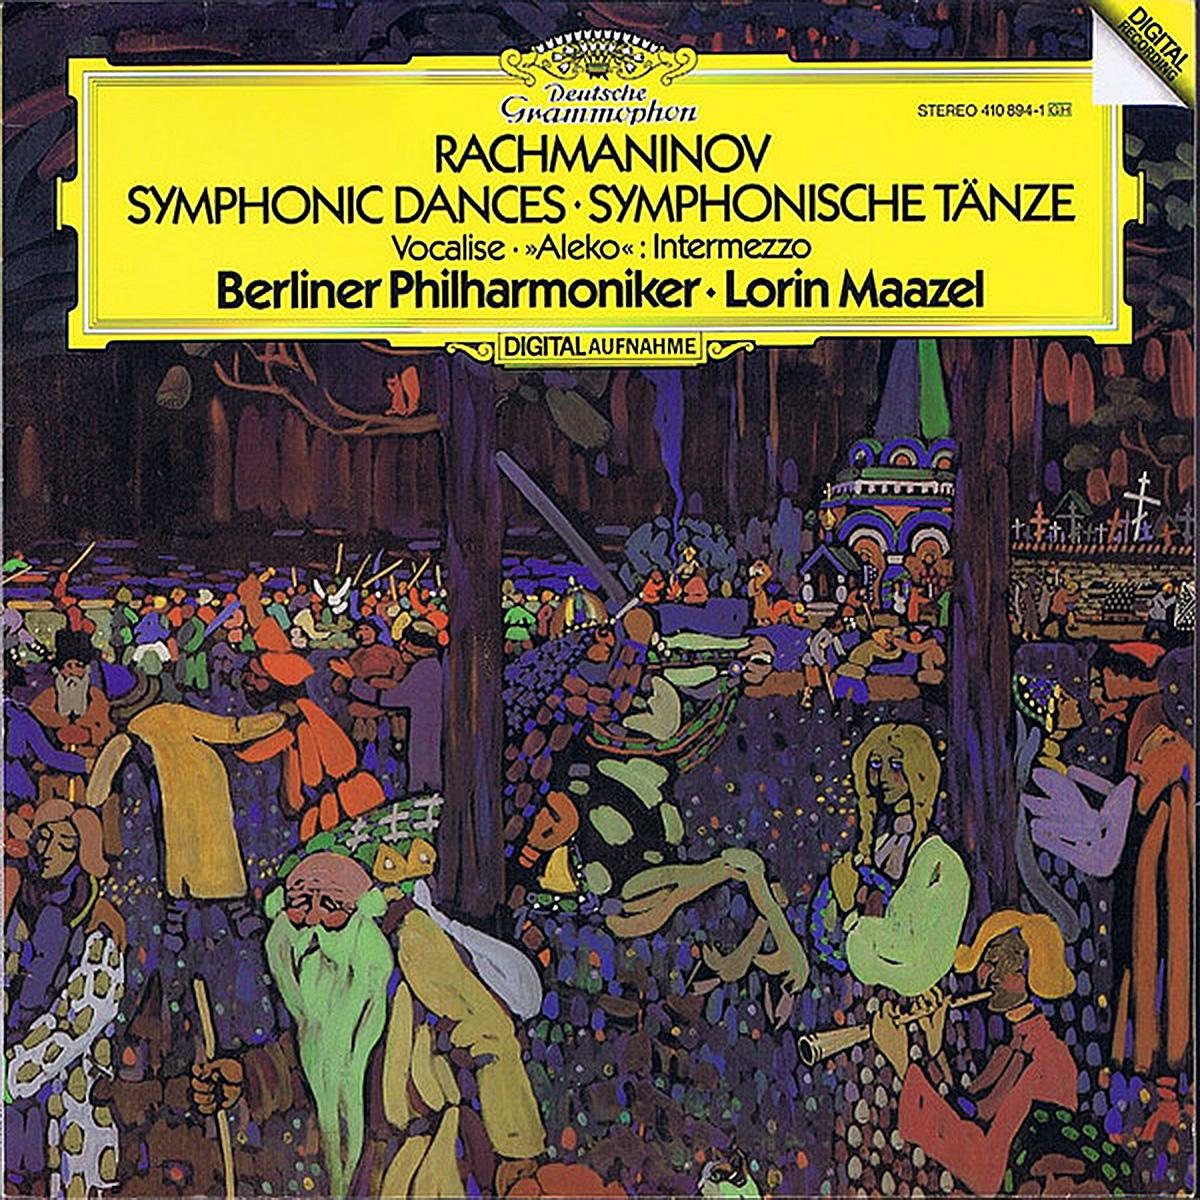 DGG 410 894 Rachmaninov Symphonic Dances VocaliseMaazel DGG Digital Aufnahme